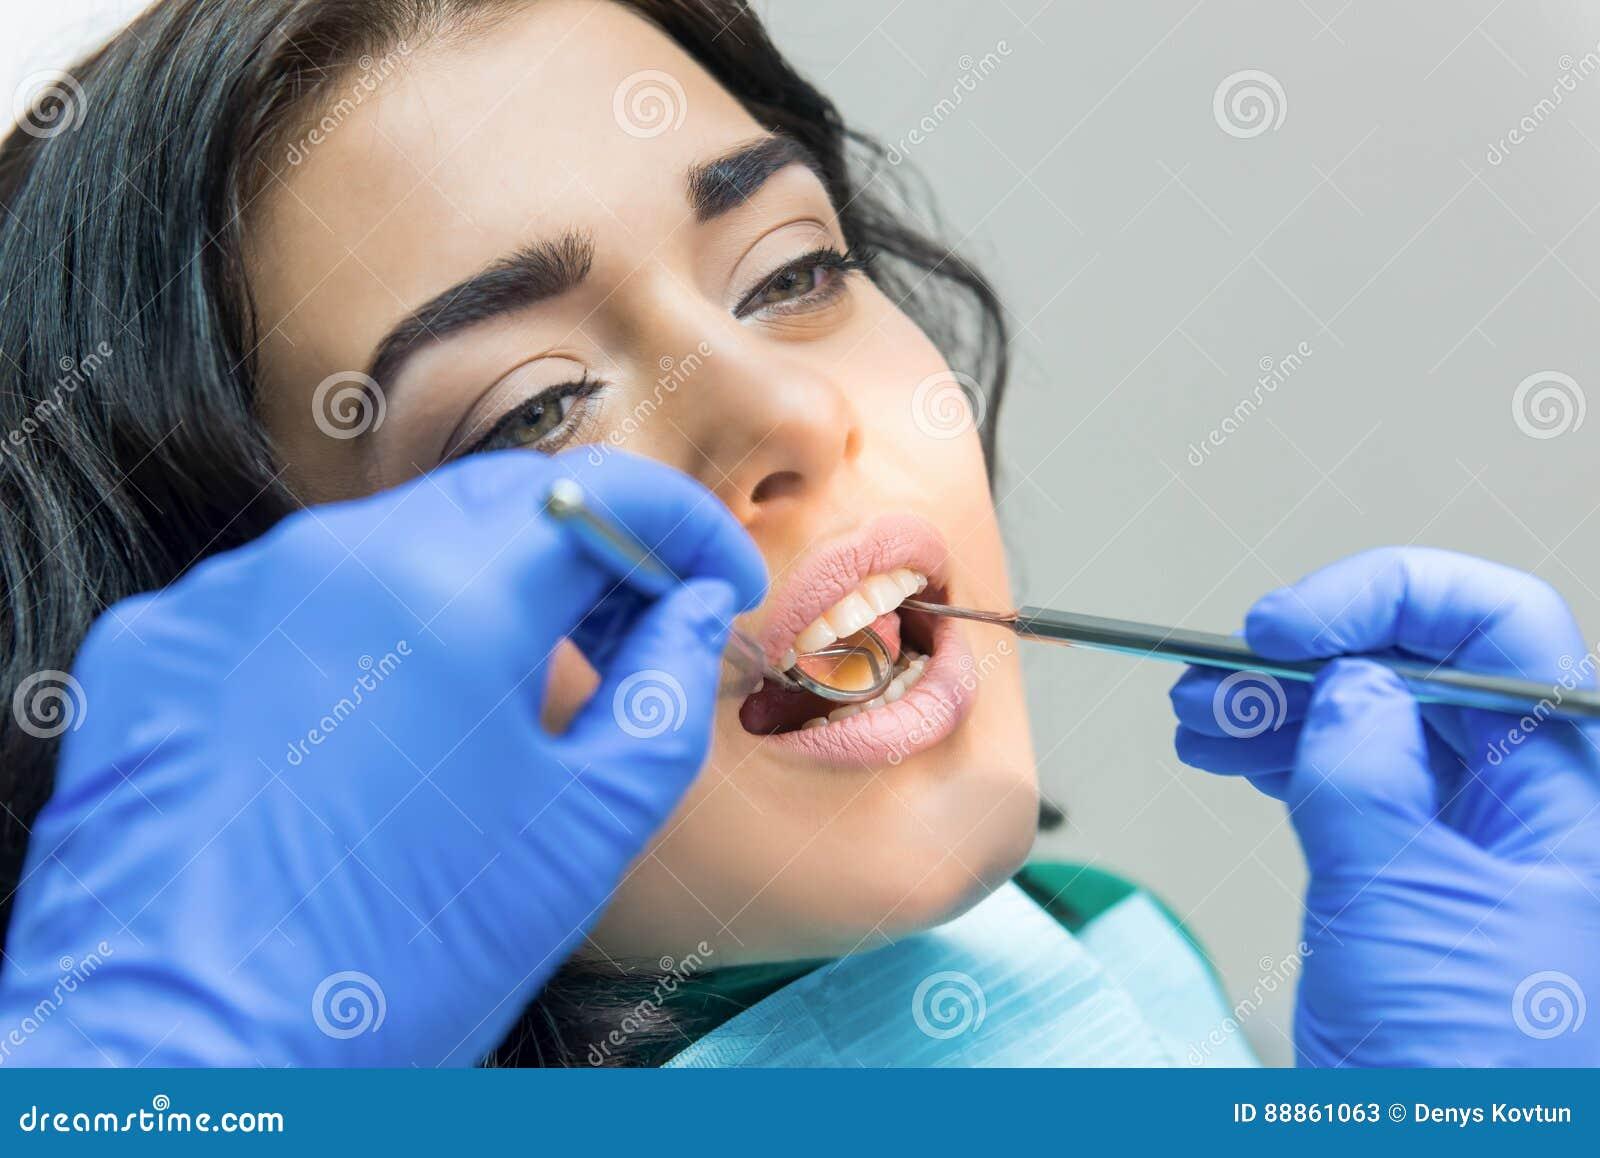 Молодая женщина на дантисте